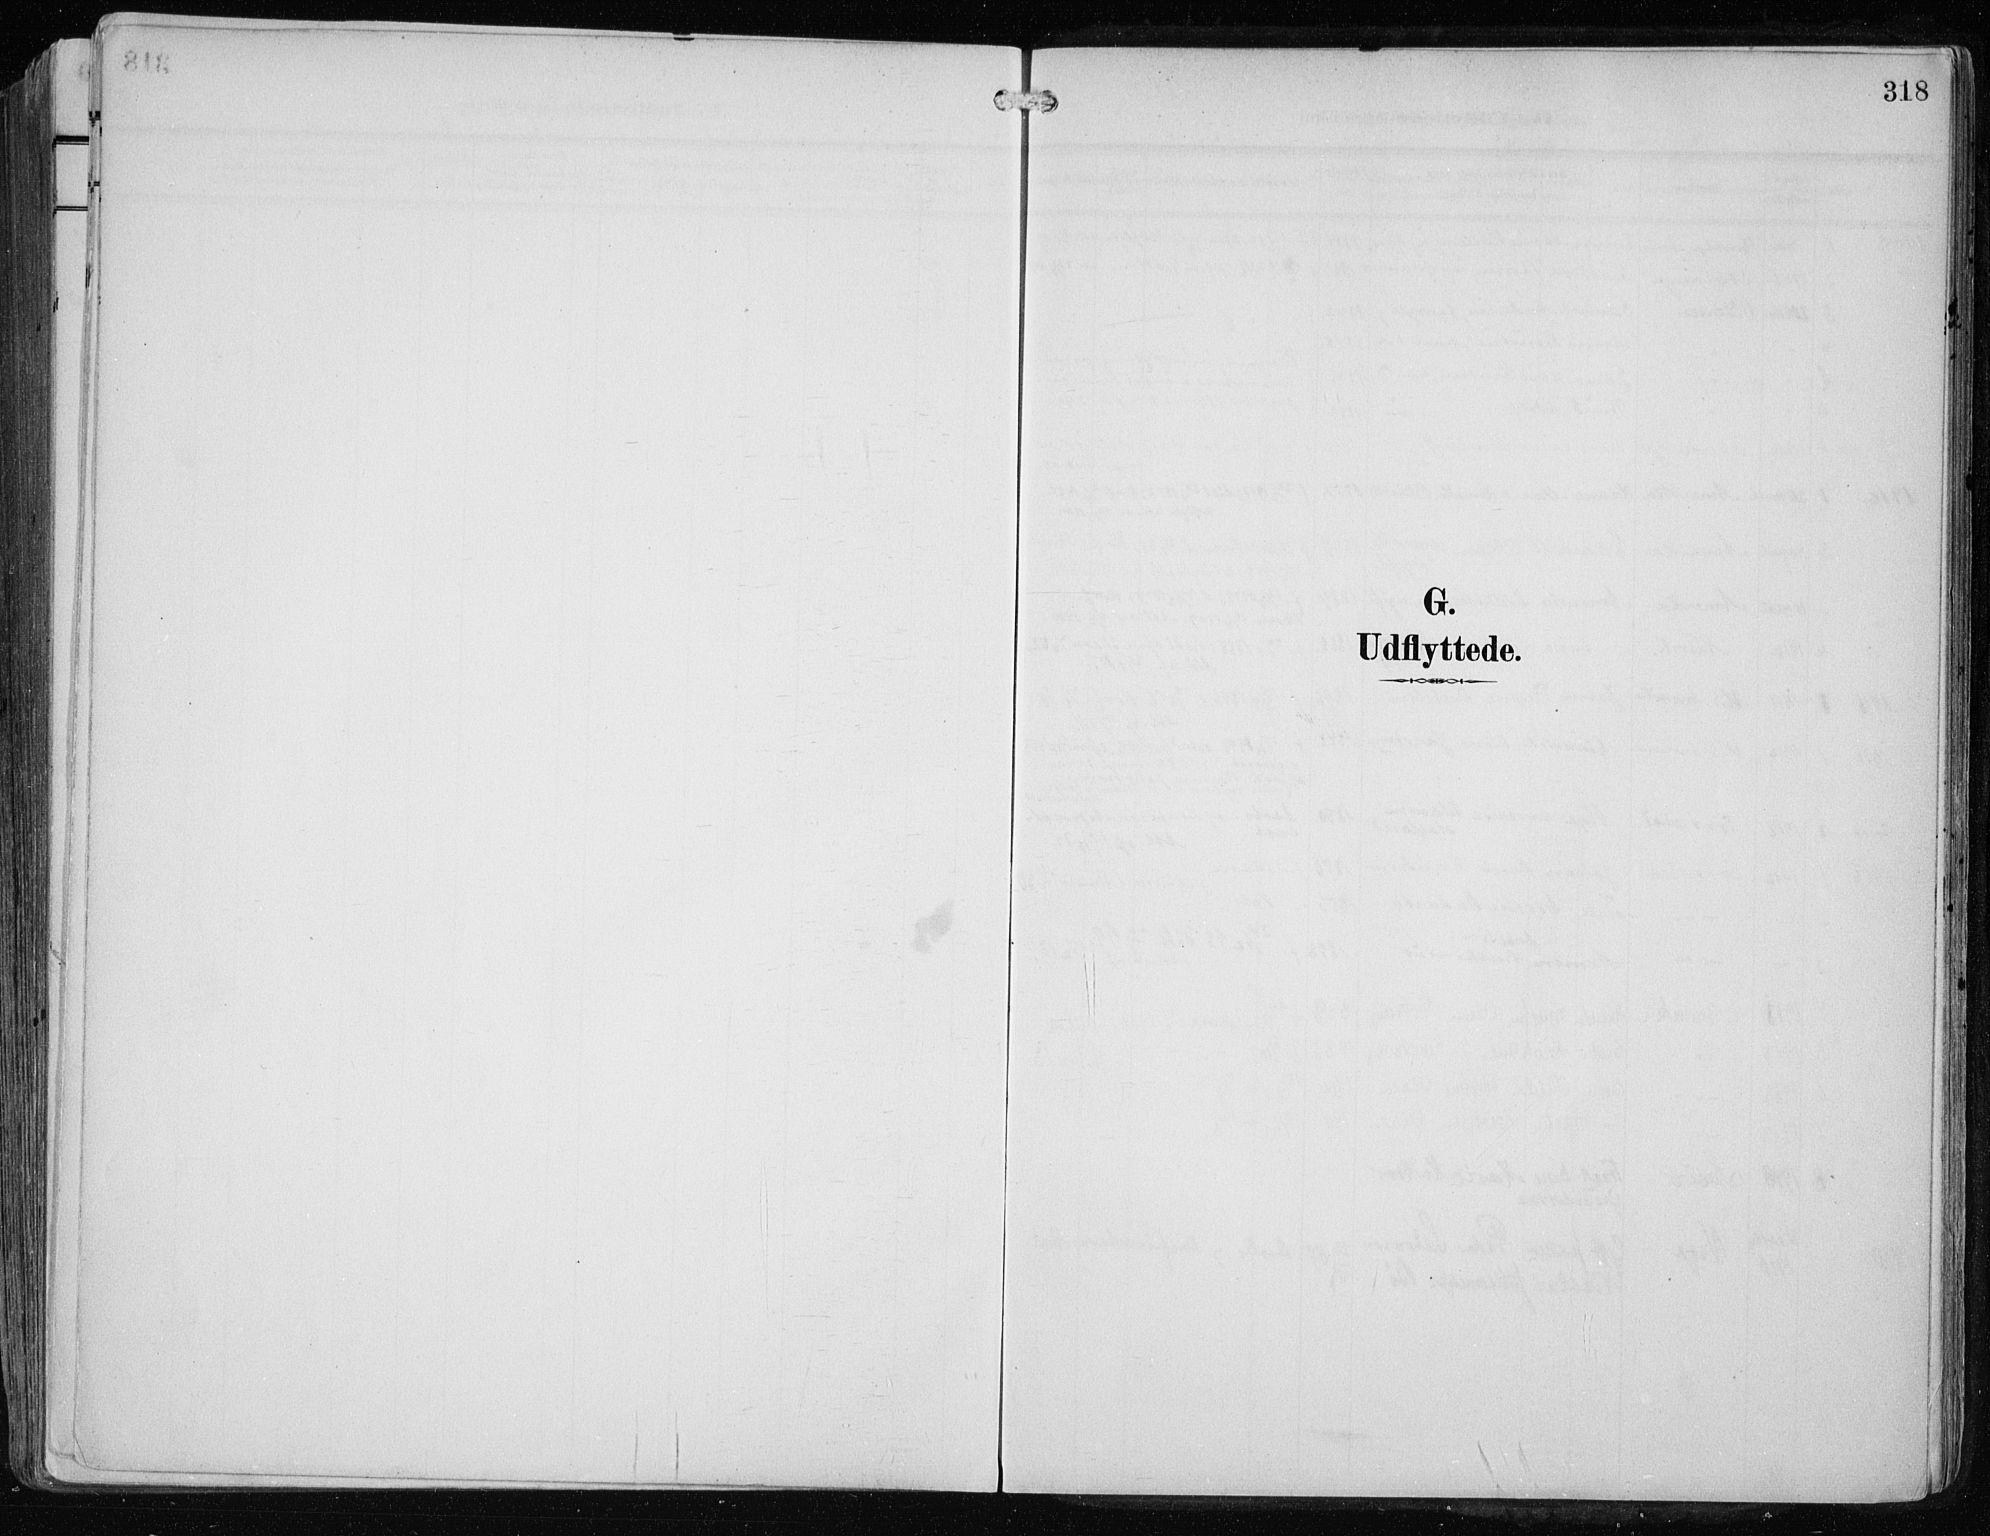 SAST, Haugesund sokneprestkontor, H/Ha/Haa/L0010: Ministerialbok nr. A 10, 1909-1935, s. 318